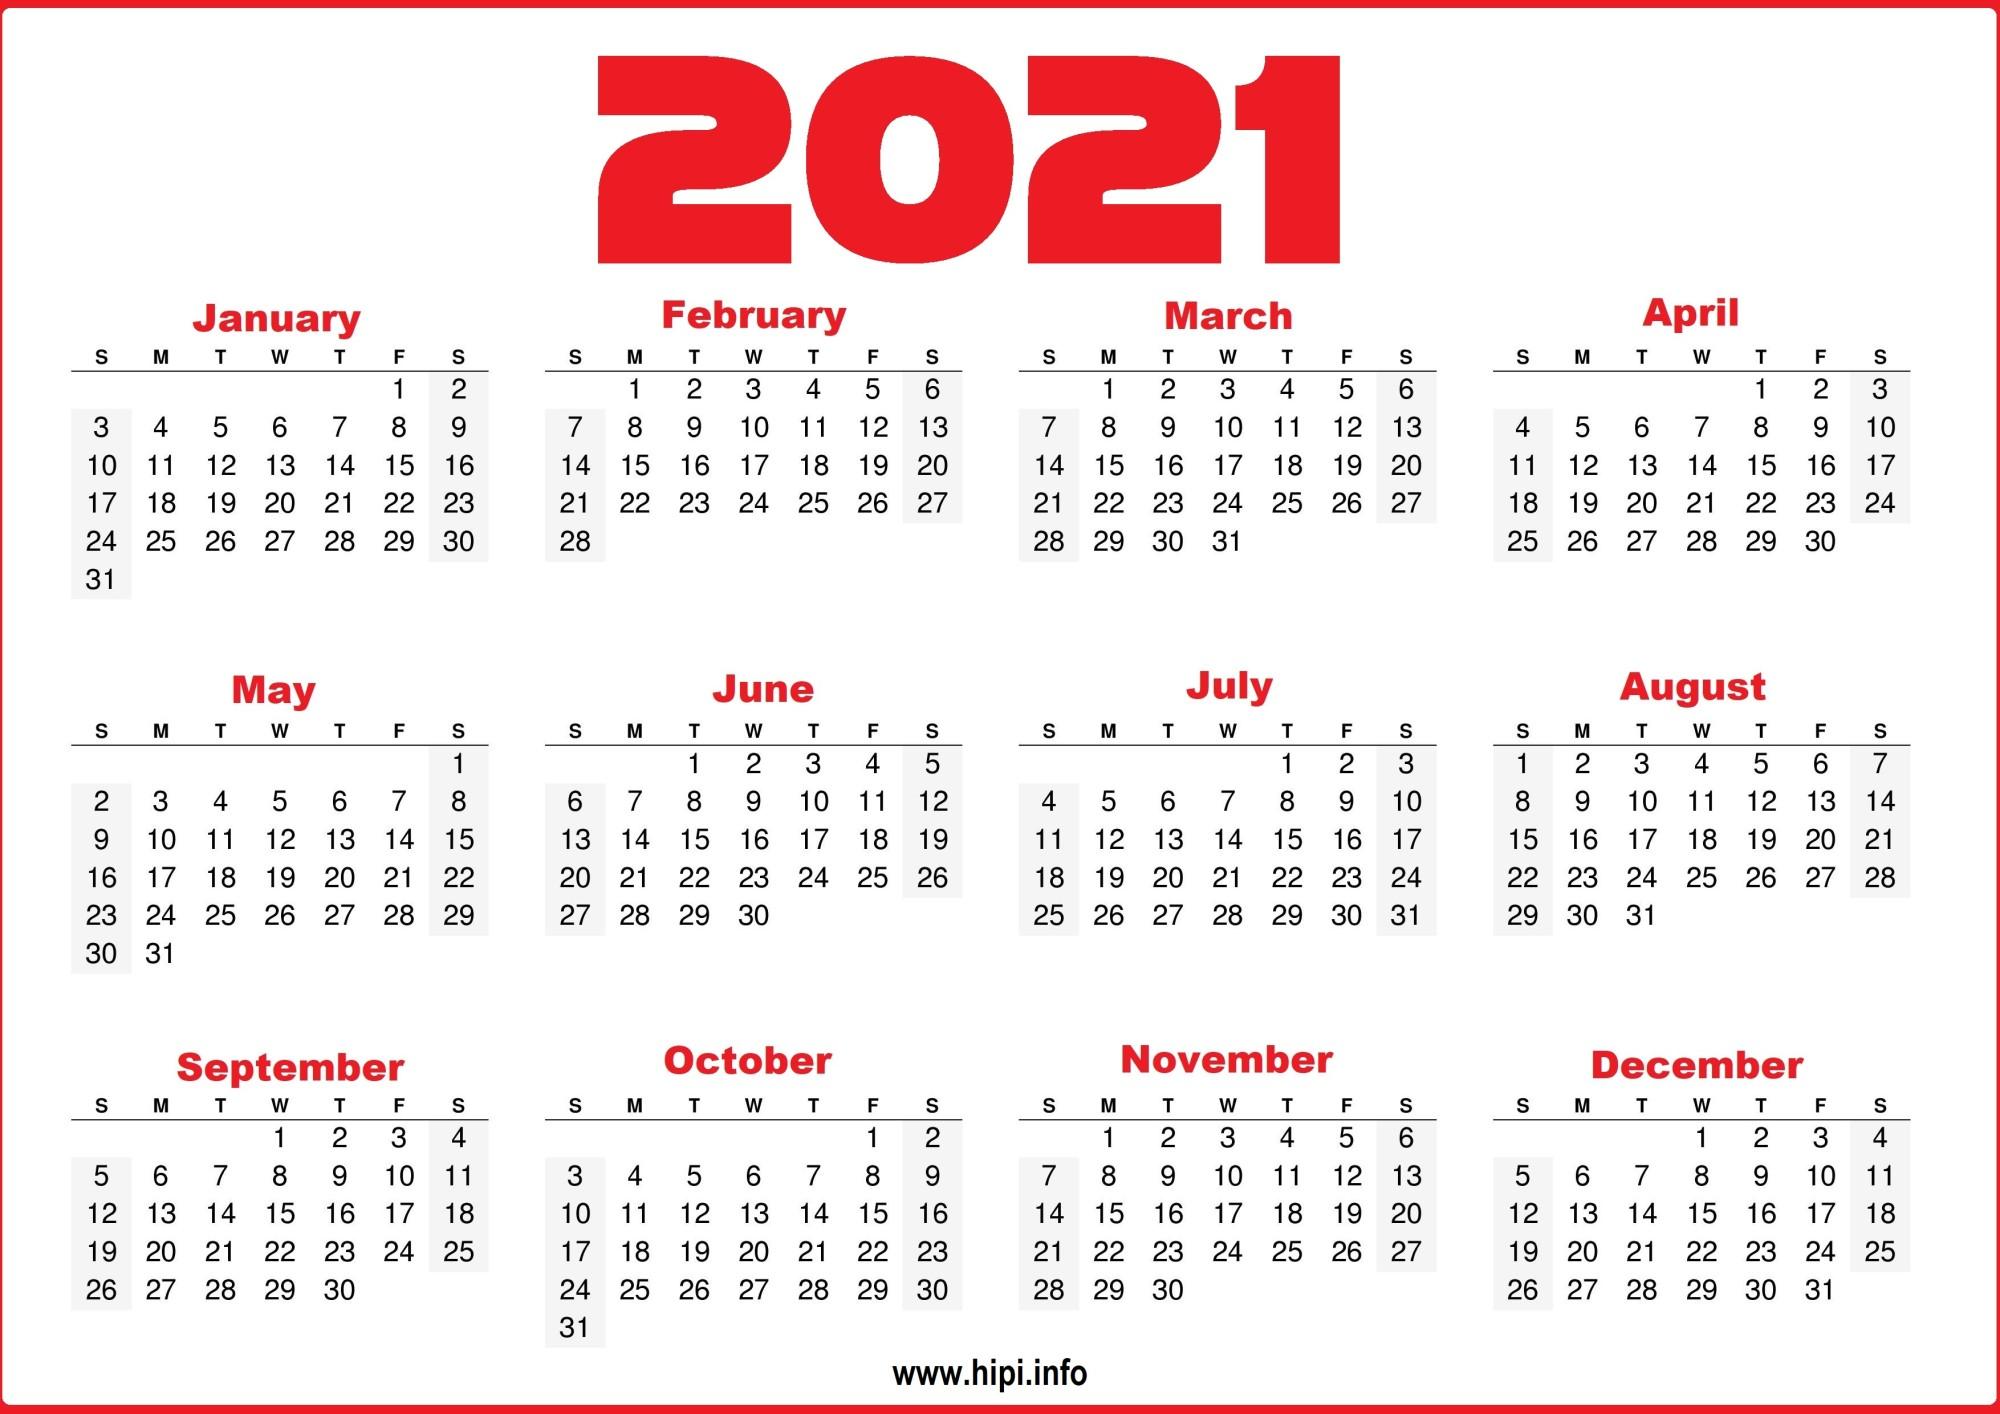 50 Best Printable Calendars 2021 Both Free and Premium